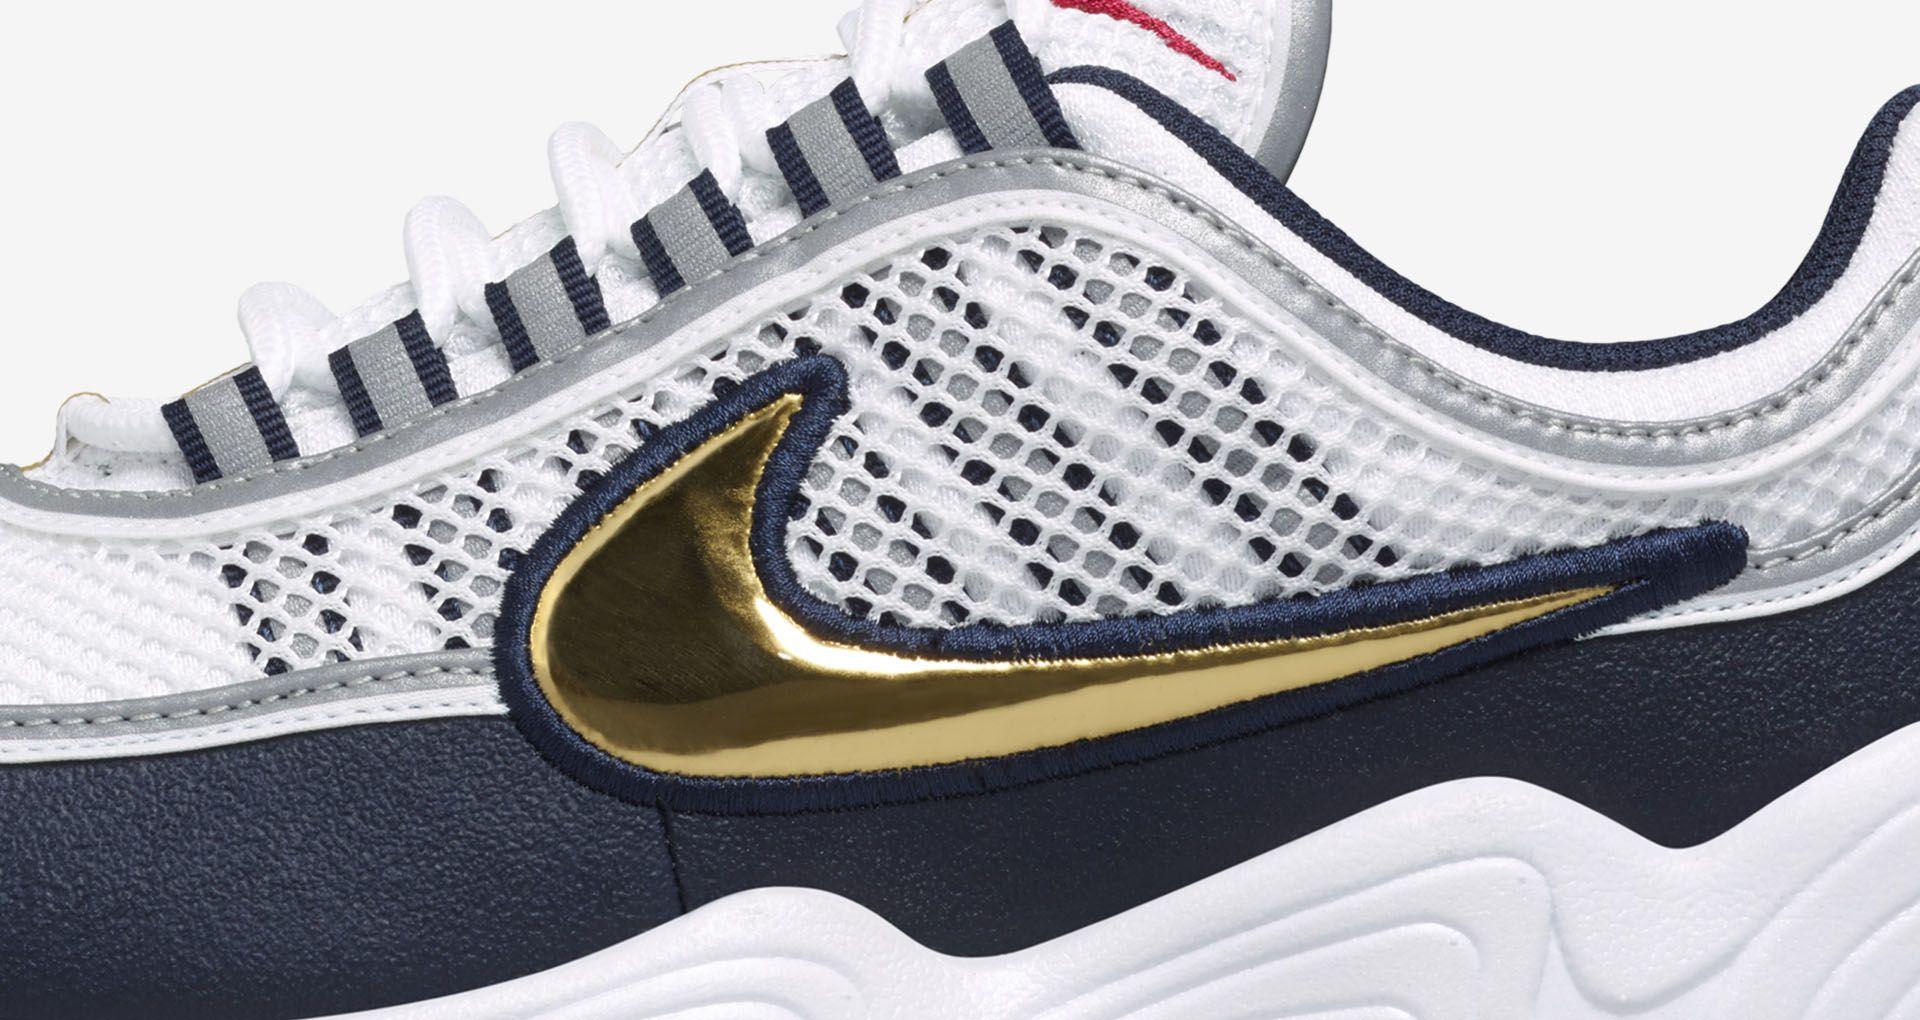 meilleure sélection c2d18 4d175 NikeLab Air Zoom Spiridon 'White & Gold' Release Date ...